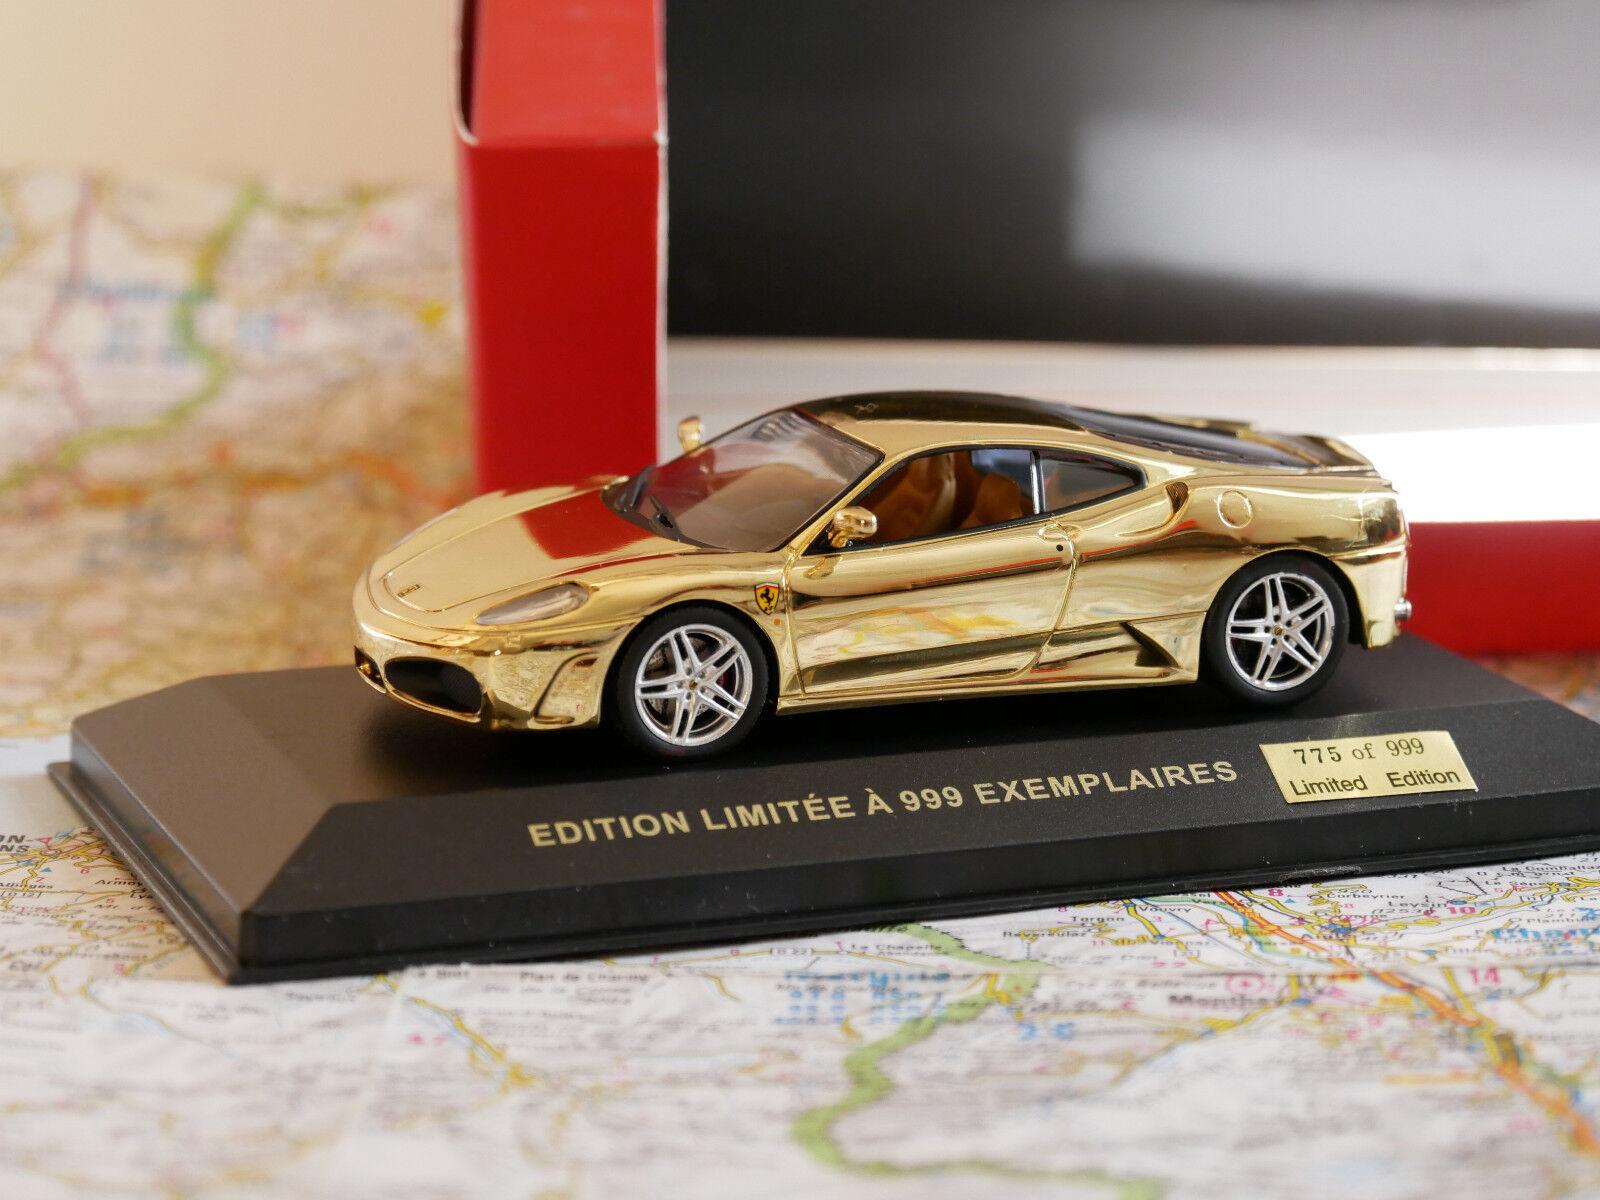 Ferrari f430 2005 ixo Gold limited edition art.cof024 händler 1 43 neue ausgabe